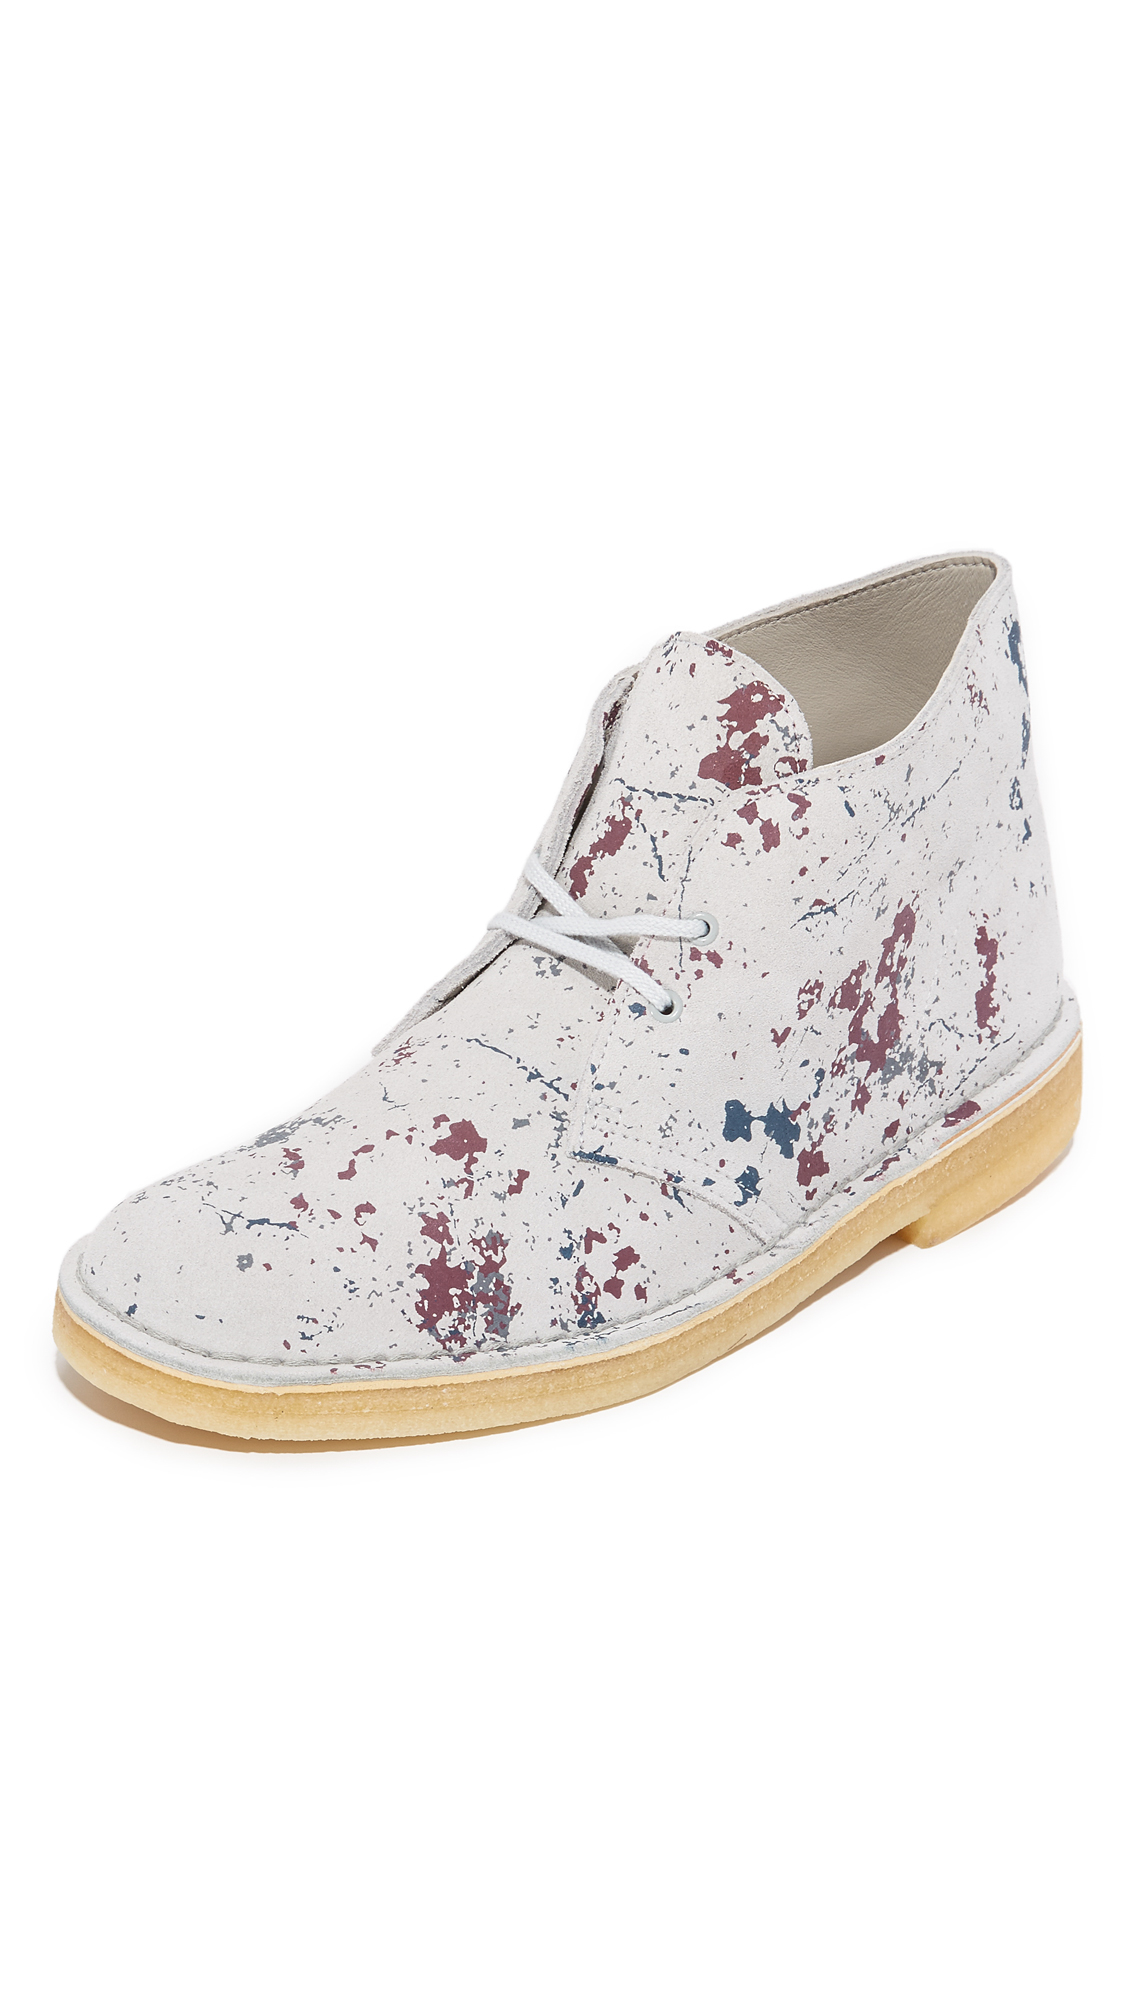 5cf10efd9824a Lyst - Clarks Paint Splatter Desert Boots for Men